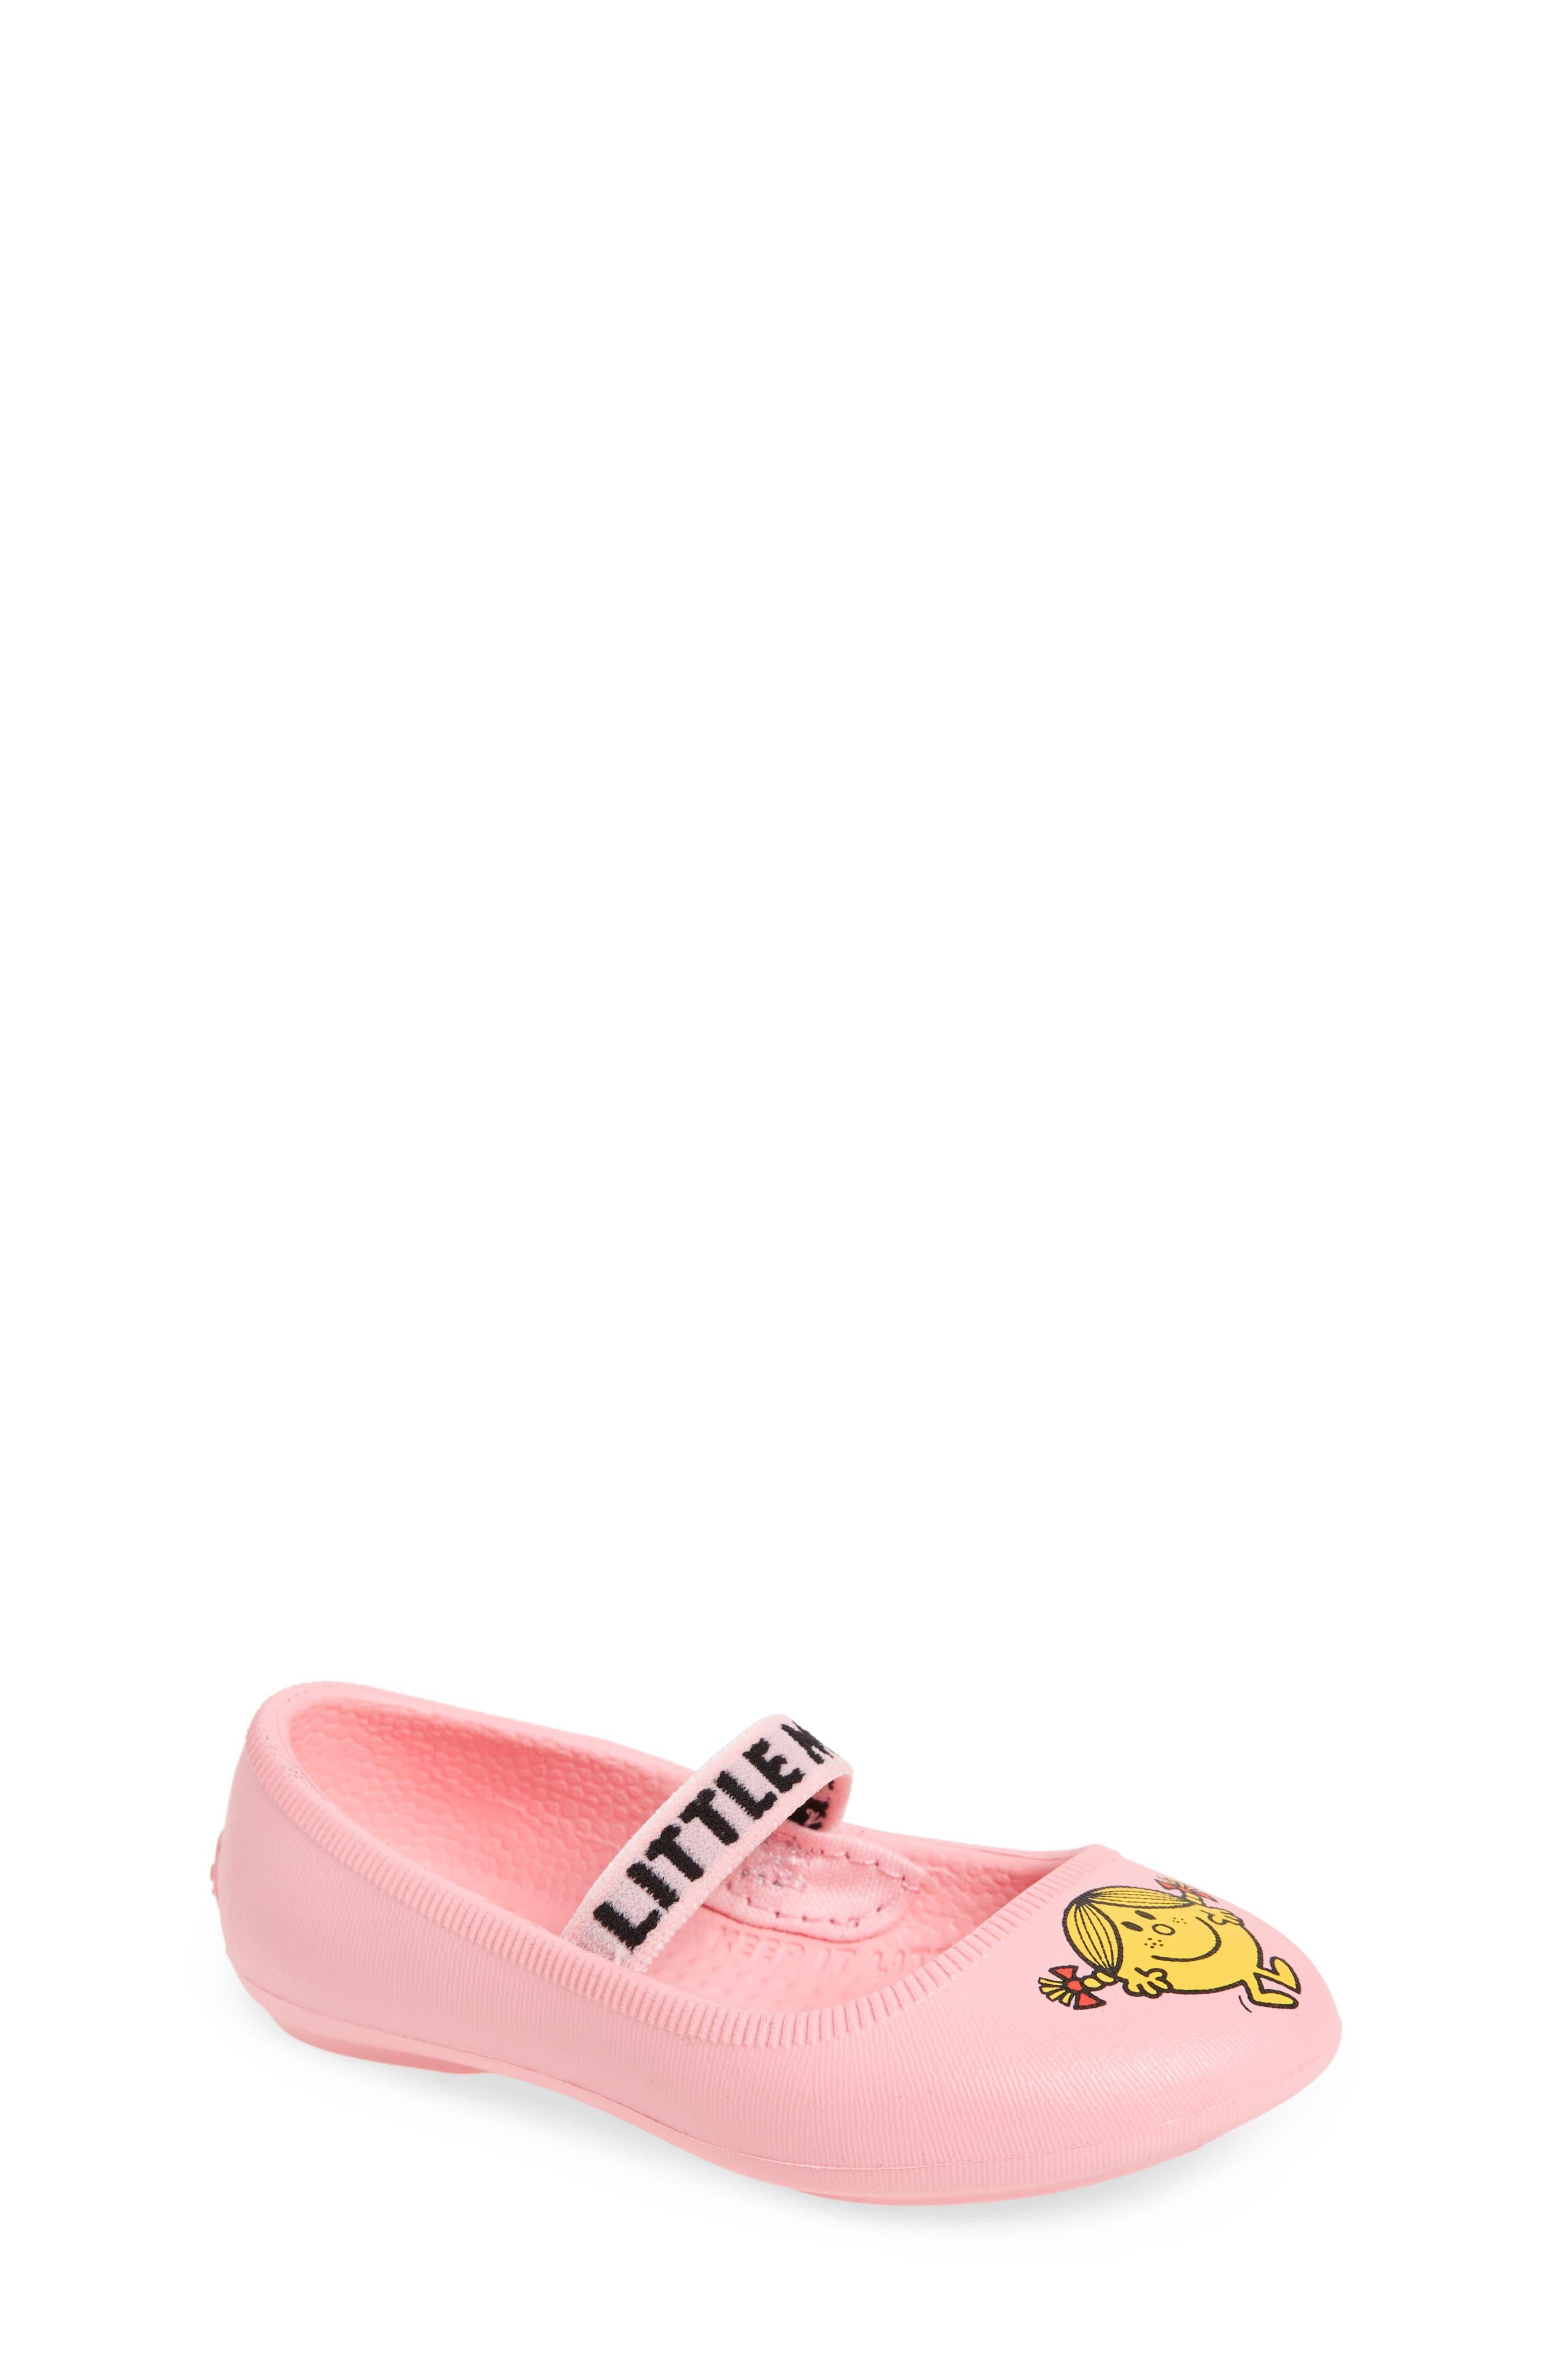 Margot Mary Jane Flat,                         Main,                         color, Pink/ Little Miss Sunshine